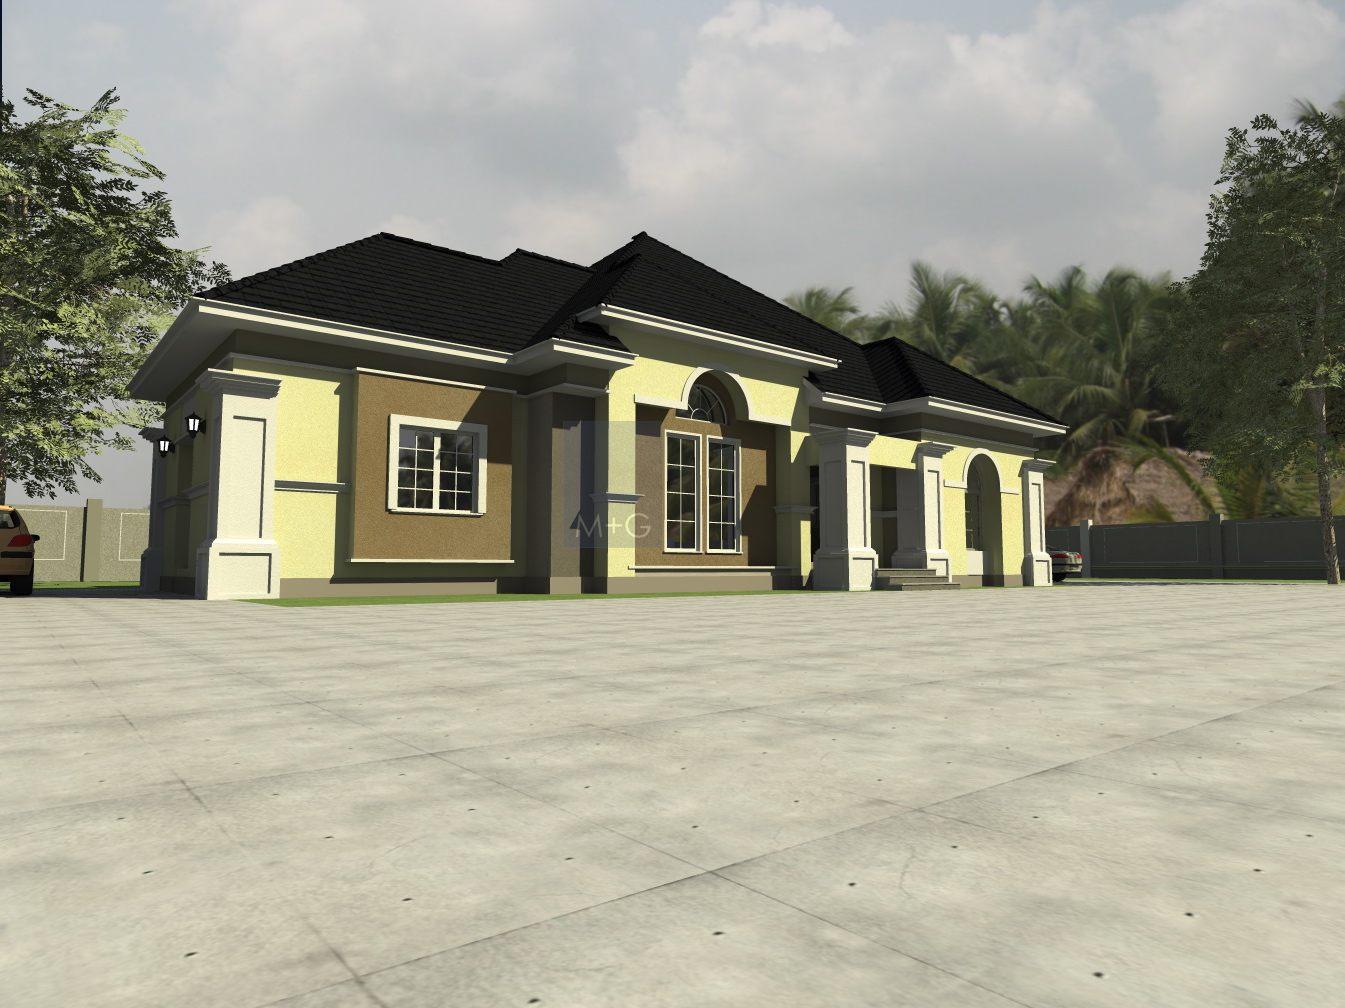 modern bungalow floor plan in nigeria joy studio design. Black Bedroom Furniture Sets. Home Design Ideas